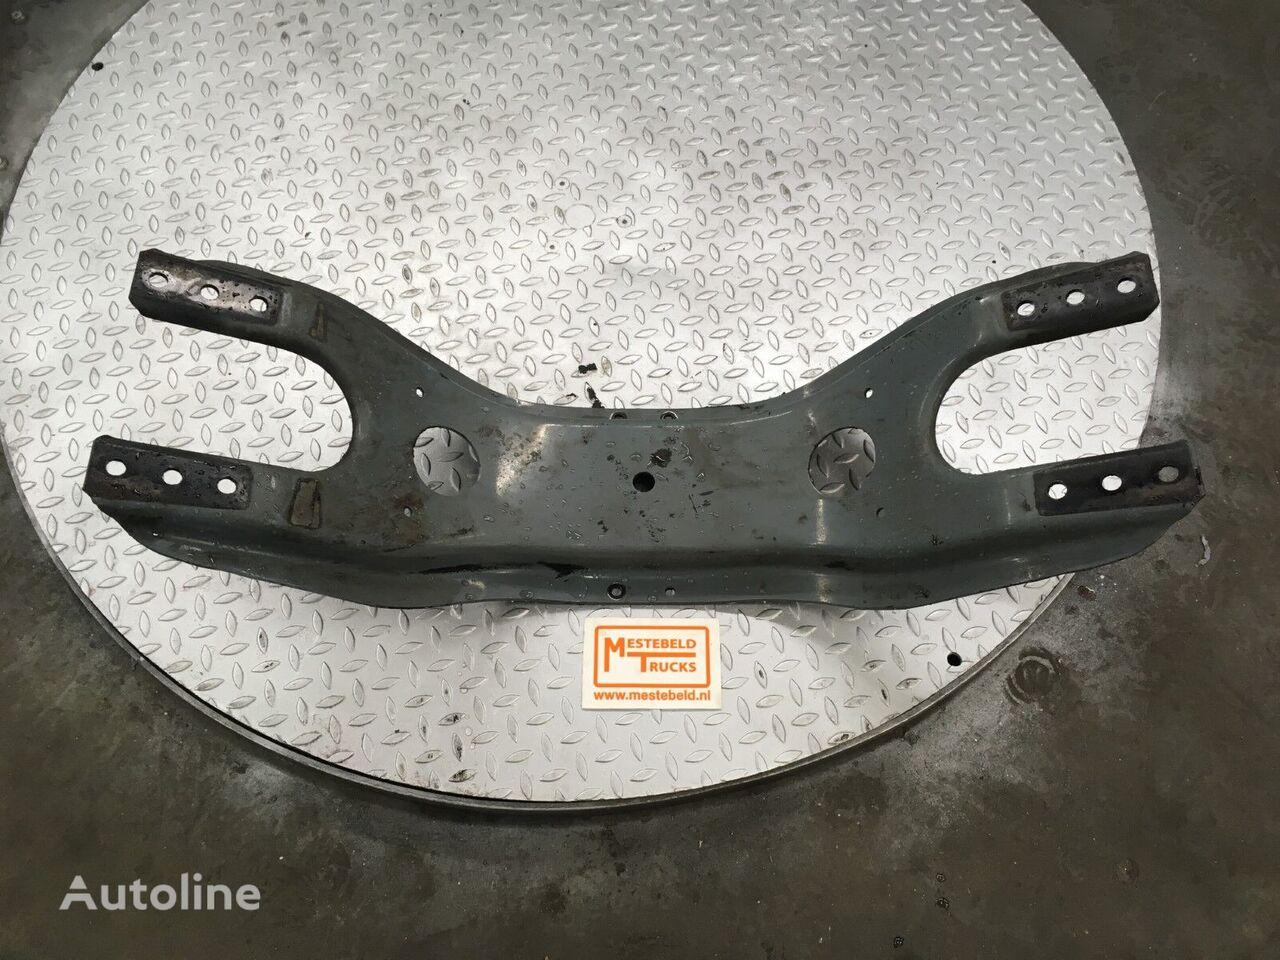 Dwarsdrager MERCEDES-BENZ fasteners for truck